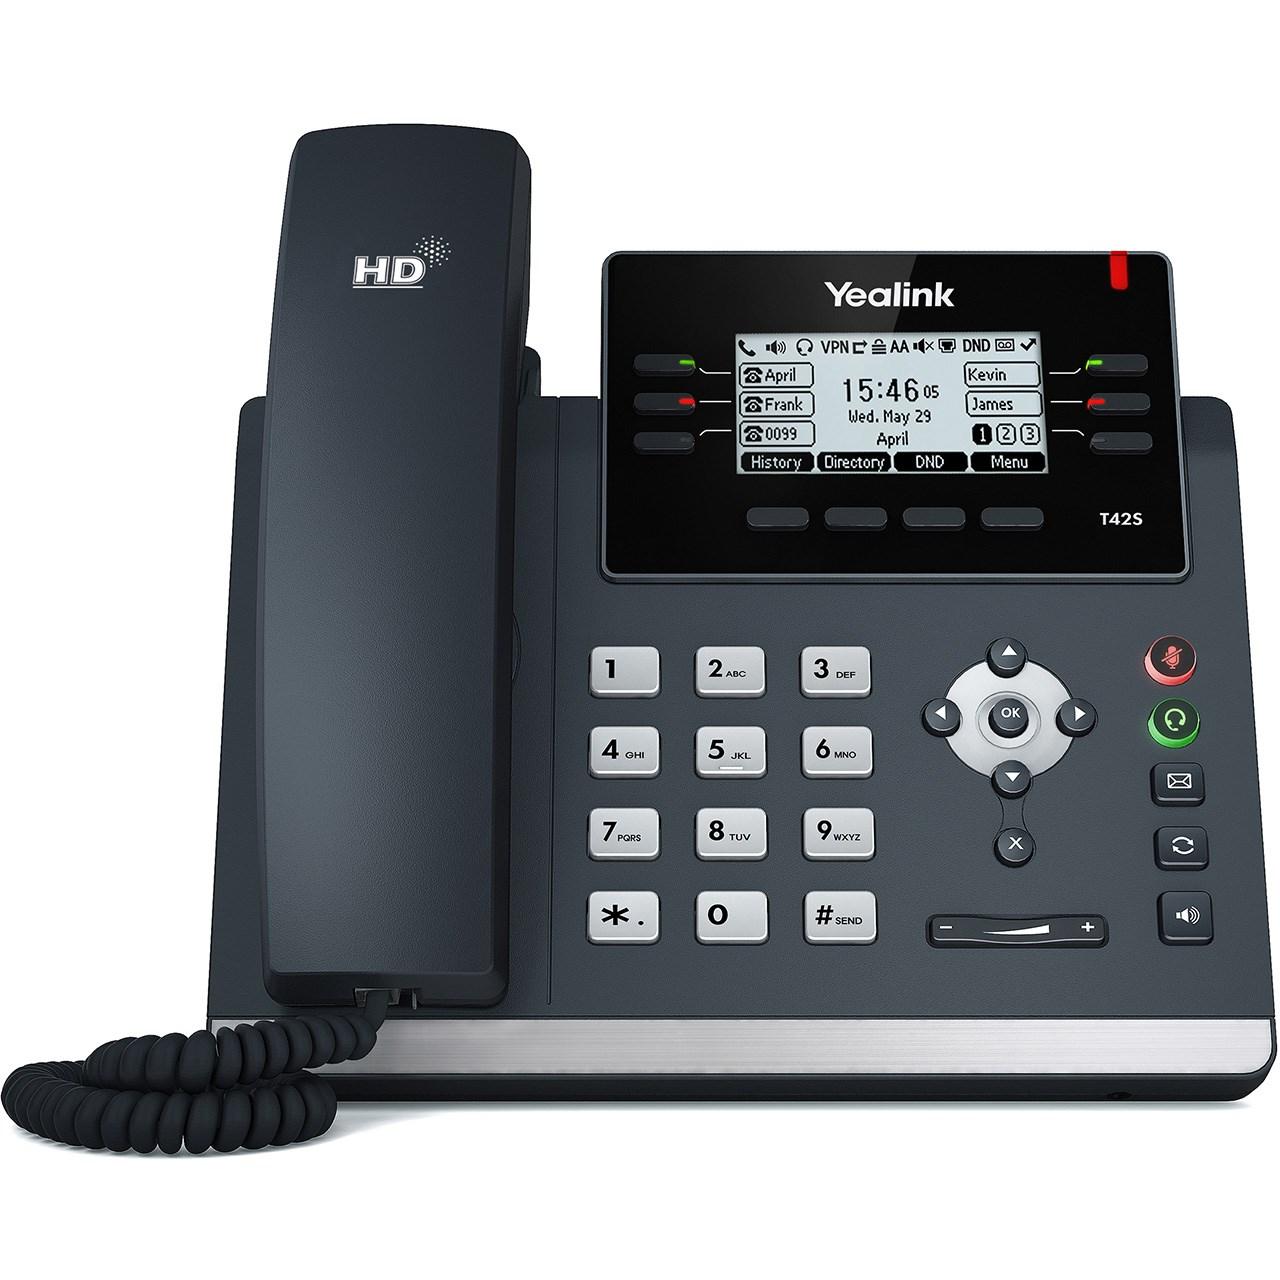 قیمت                      تلفن تحت شبکه یالینک مدل SIP T42S